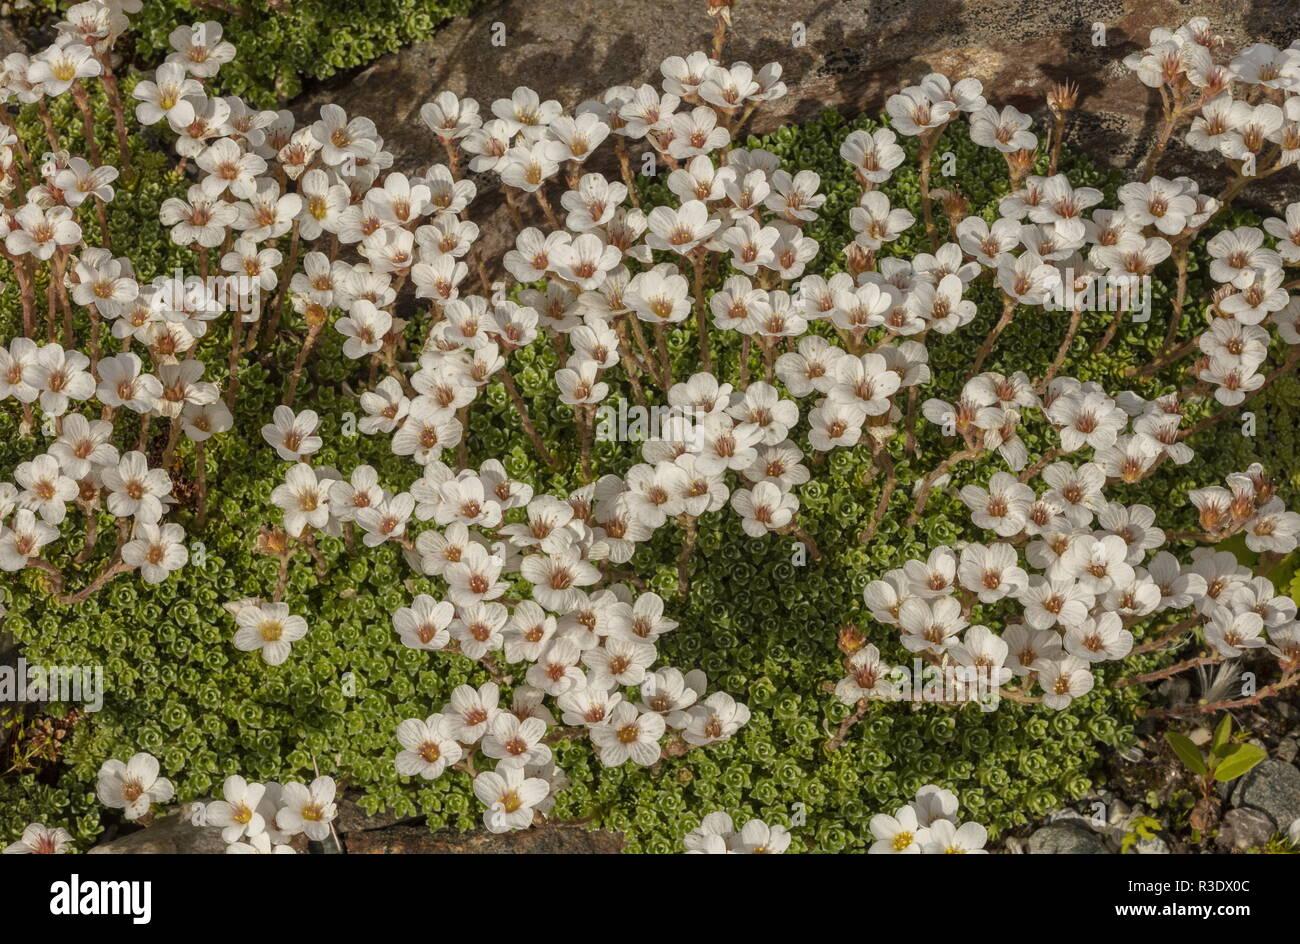 Kabschia Saxifrage, Saxifraga marginata, in flower; from the Balkans and Italy. Stock Photo